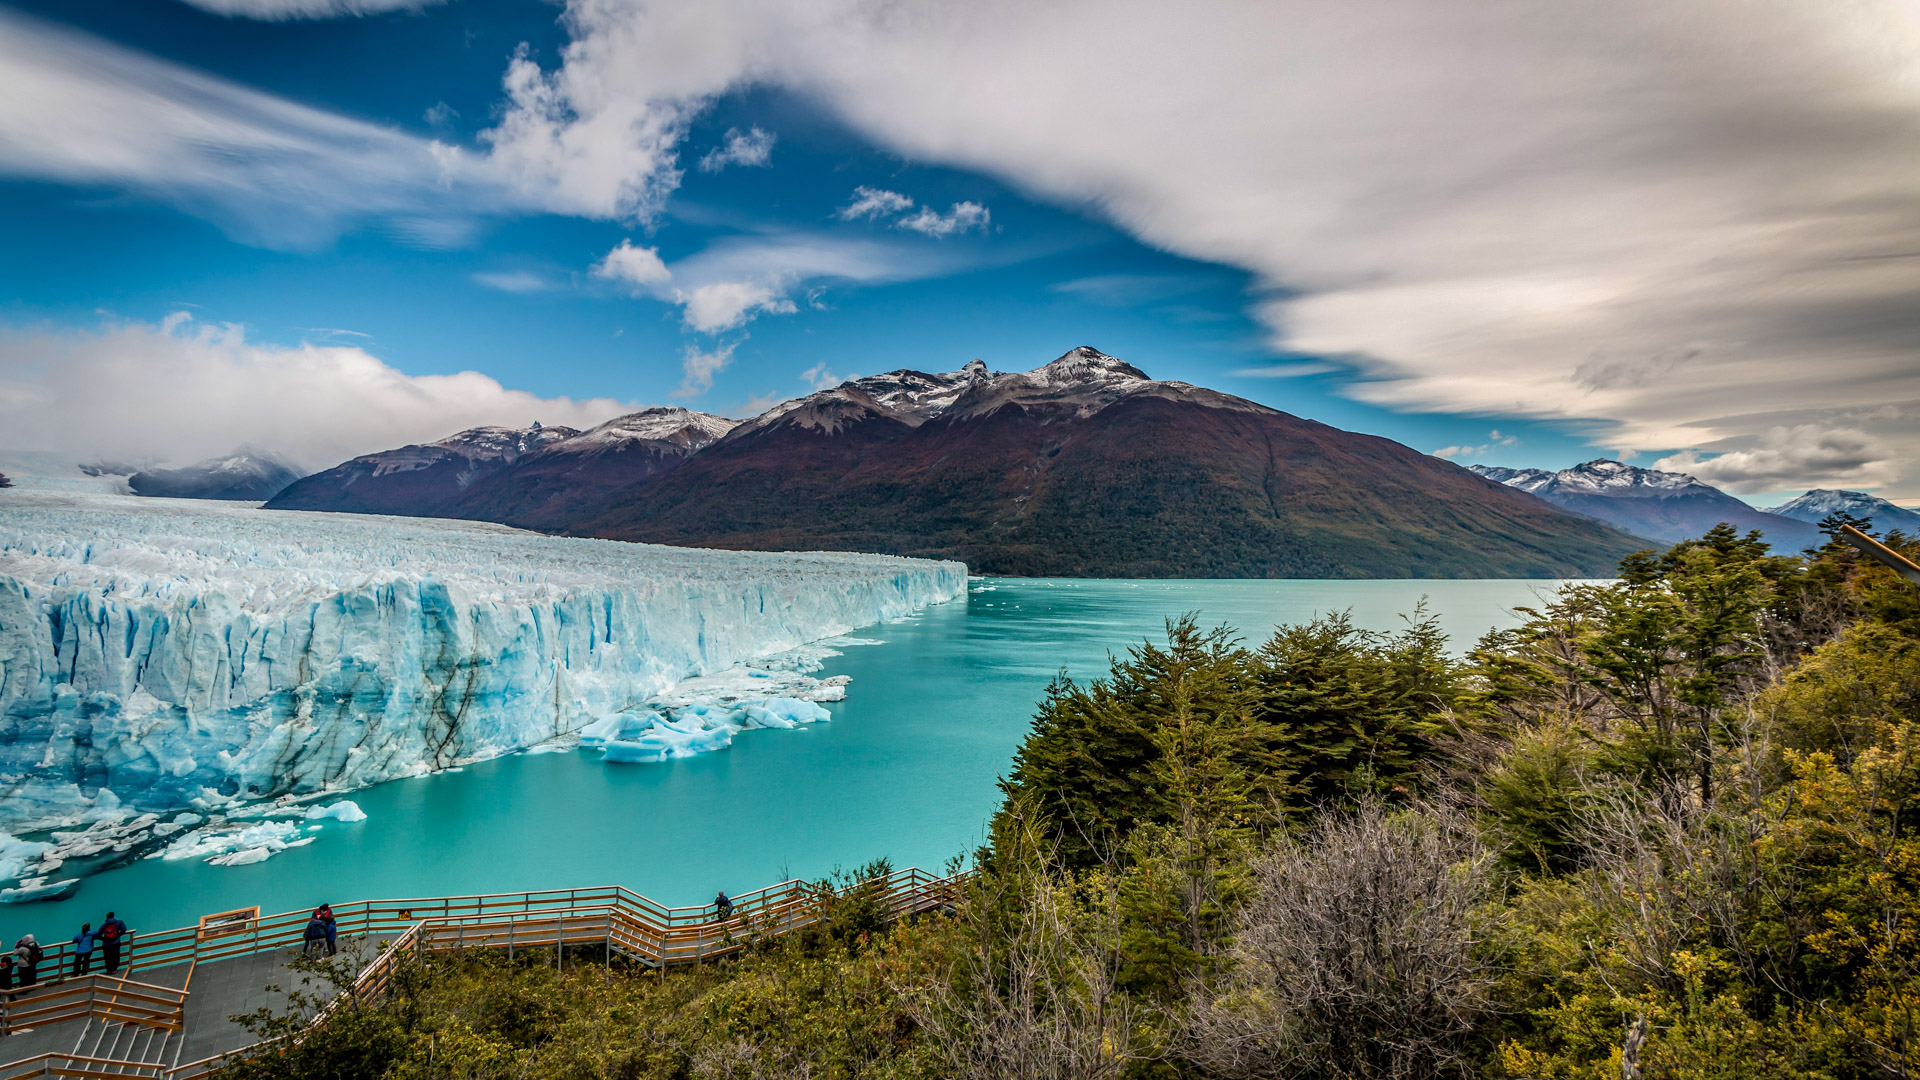 Der beeindruckende Perito Moreno Gletscher im Nationalpark Los Glaciares